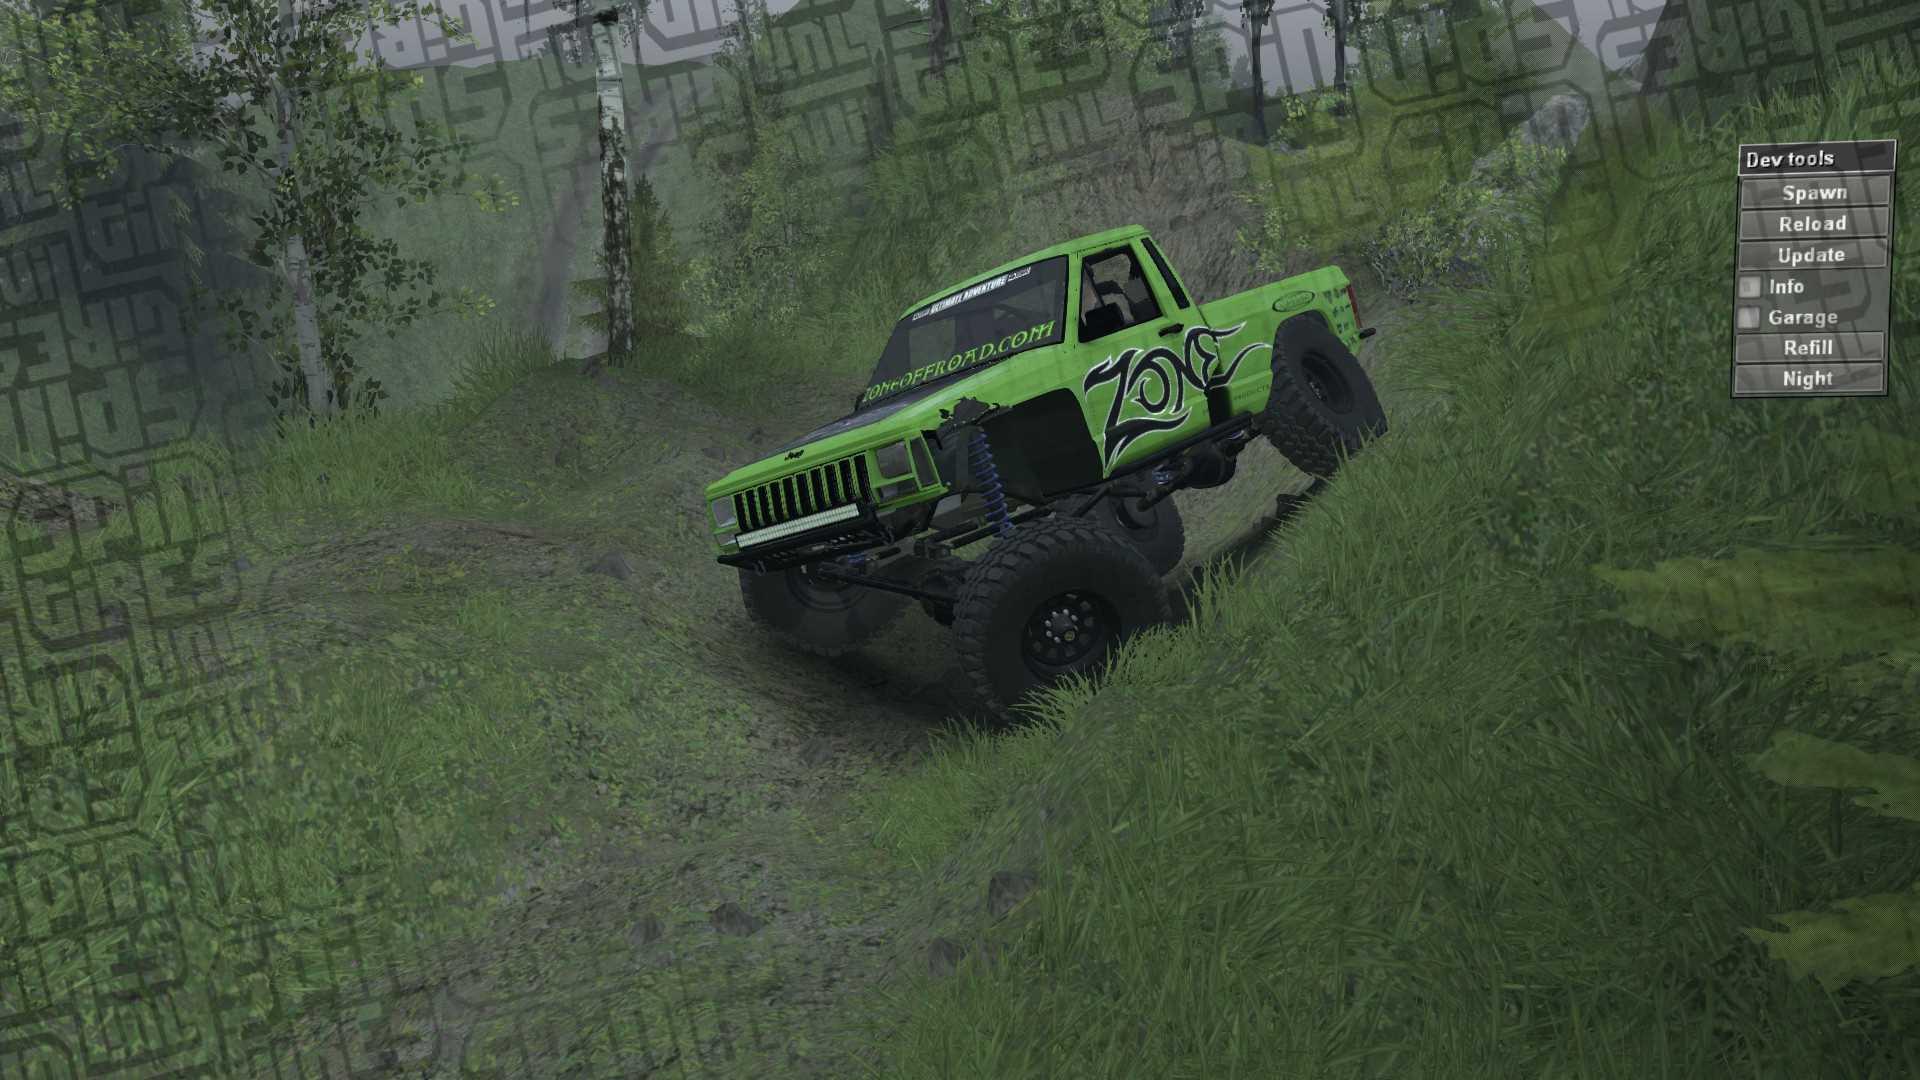 KentBobo Spintires Map - Jeep WJ